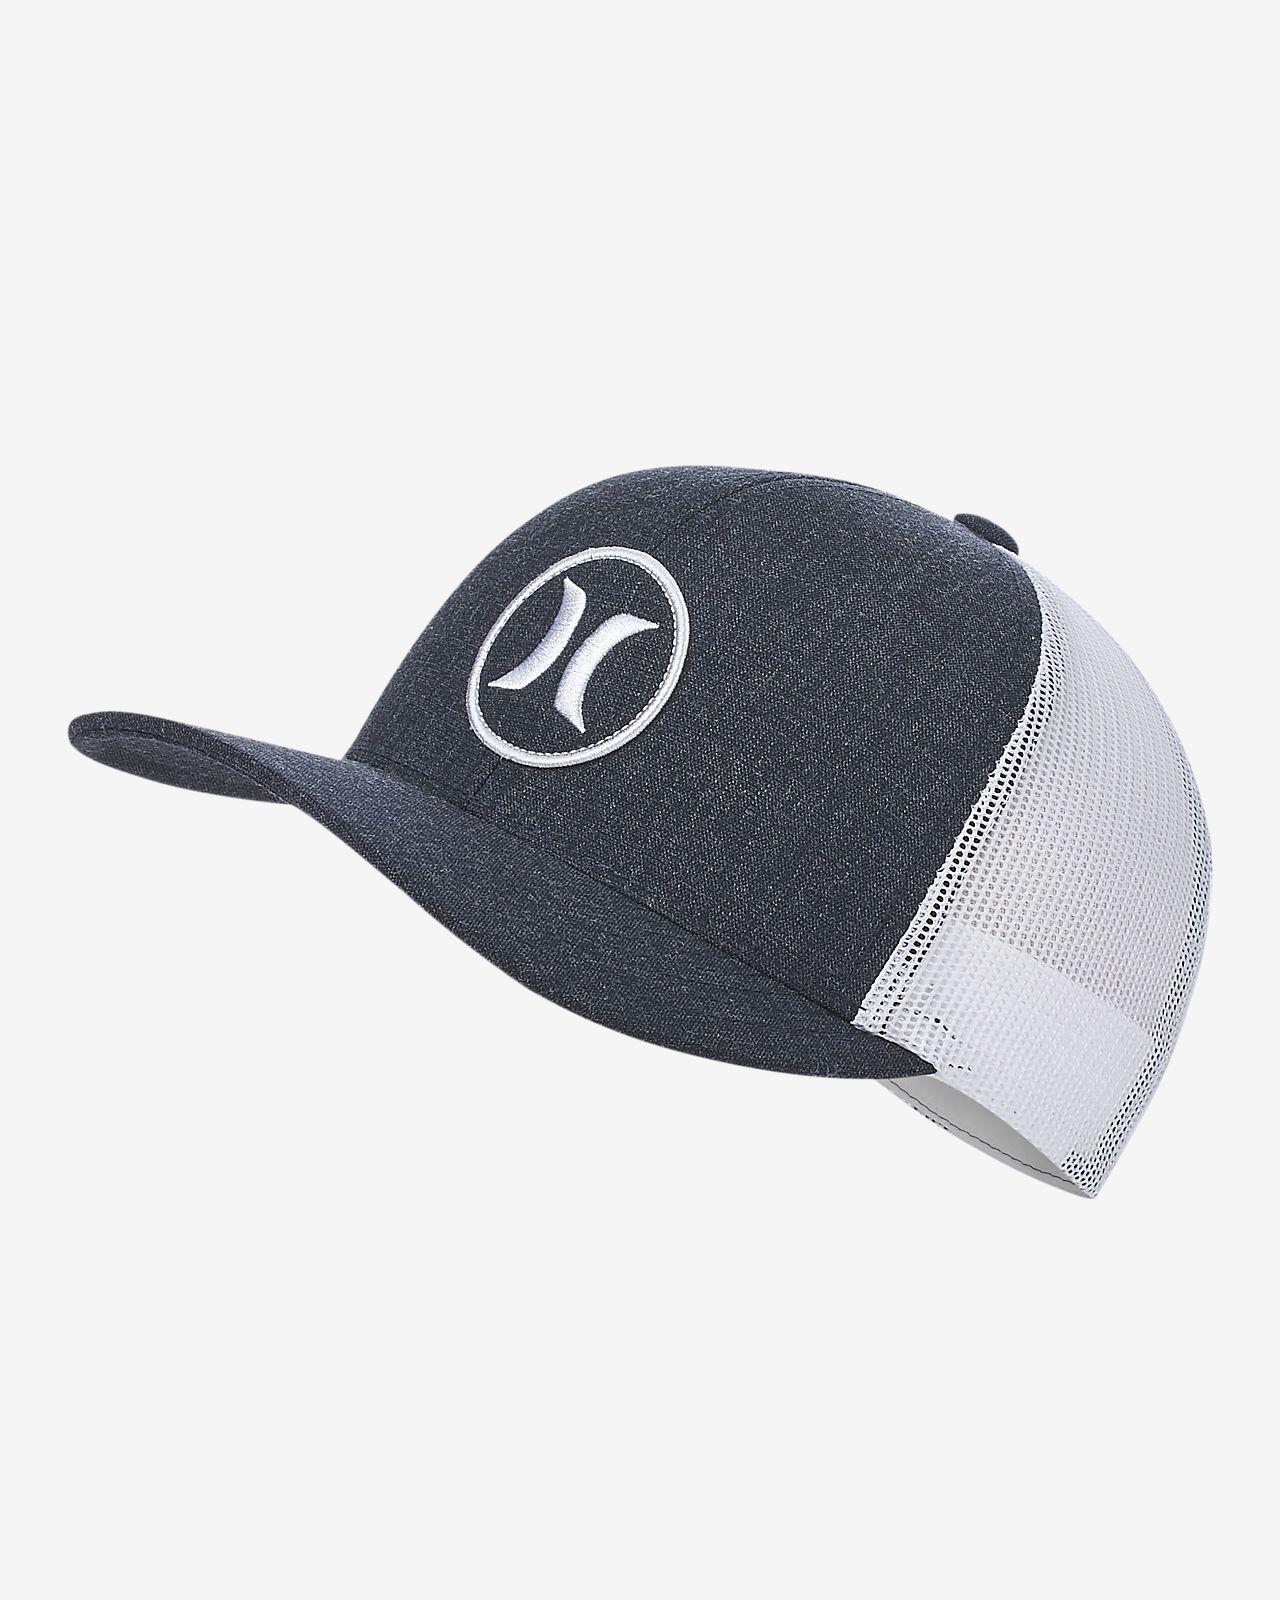 Hurley Oceanside Men's Hat